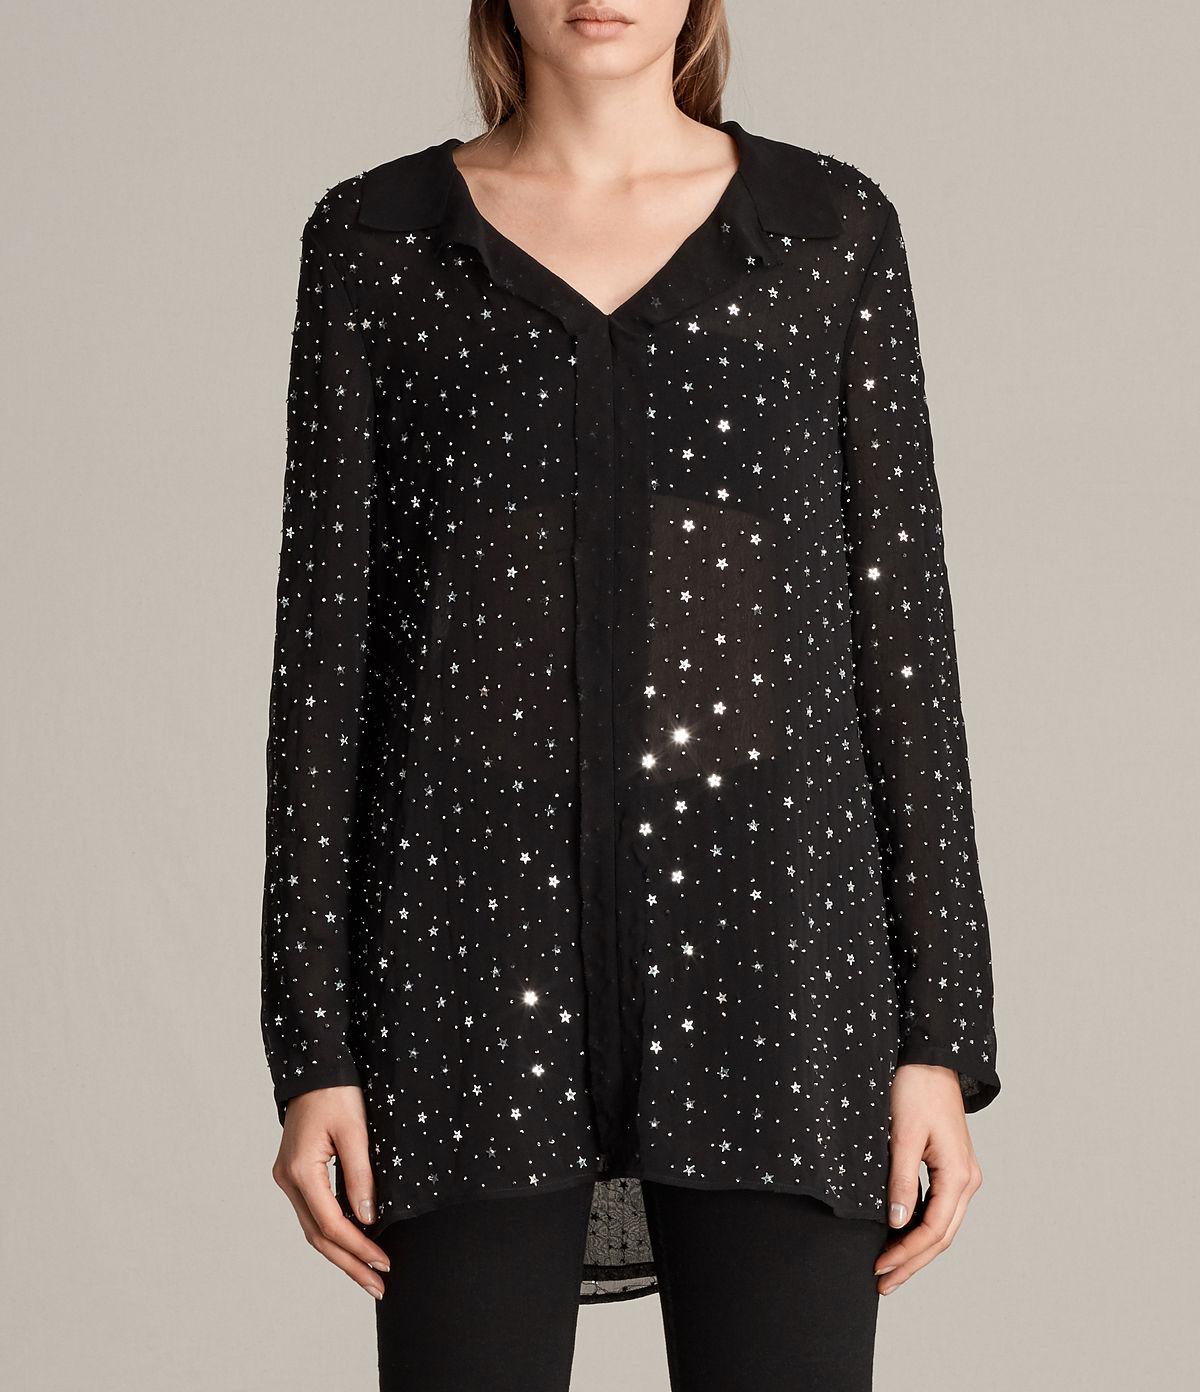 shalien-star-shirt